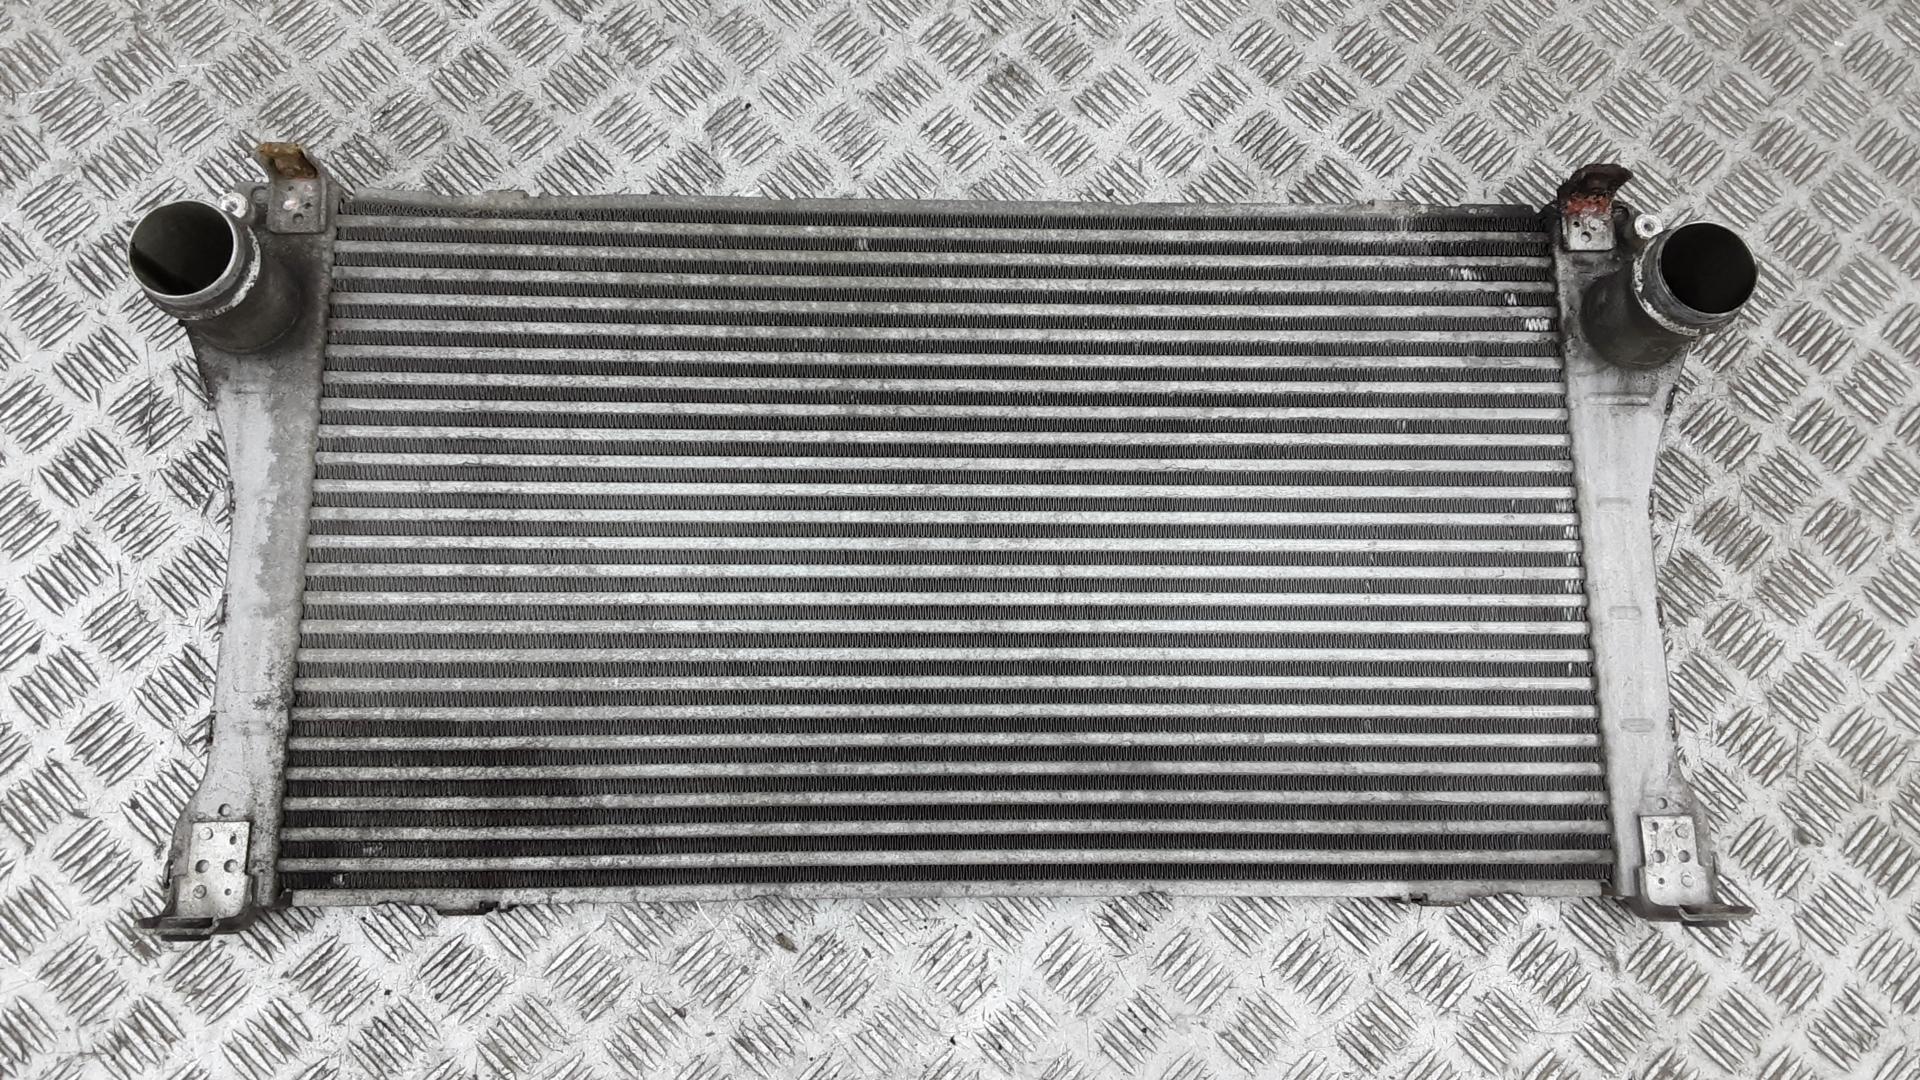 Радиатор интеркулера, TOYOTA, AURIS E150, 2008